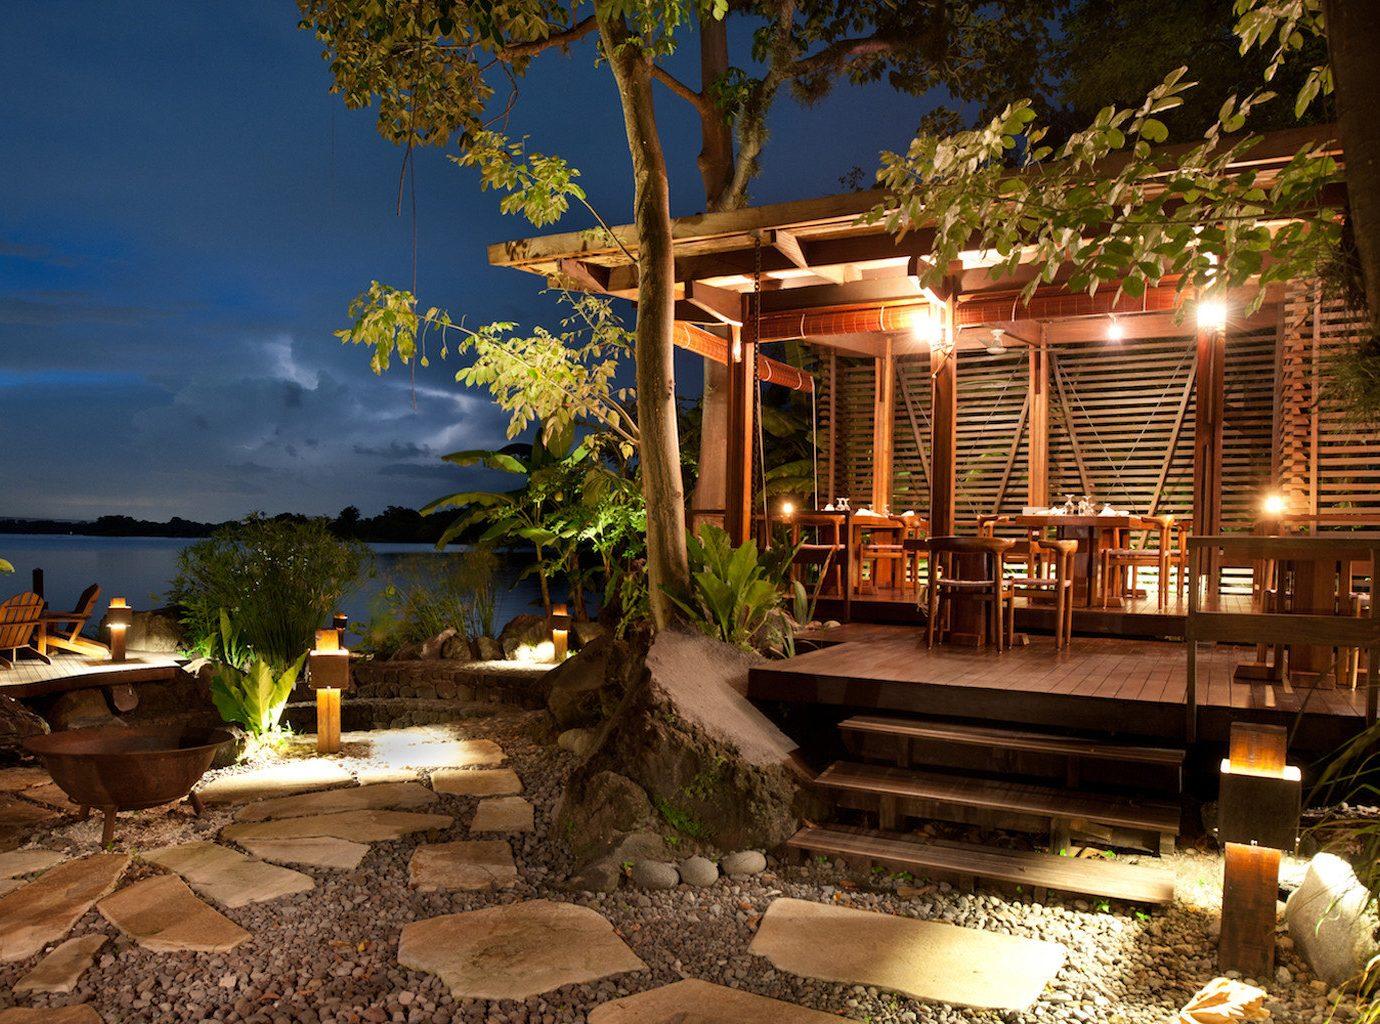 Jetsetter Guides tree outdoor house Resort estate home vacation backyard landscape lighting Villa mansion light restaurant Courtyard decorated Christmas